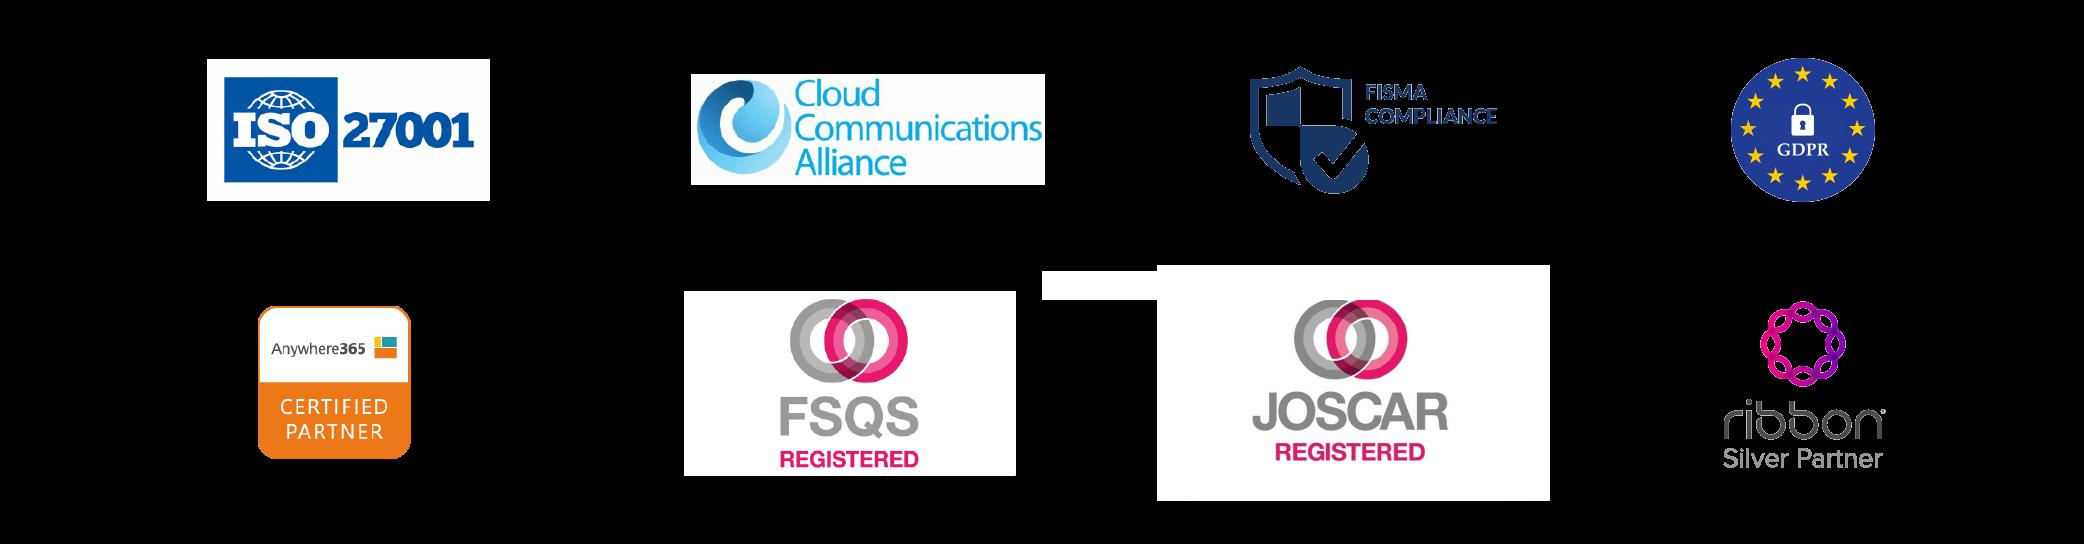 LoopUp International Accreditations